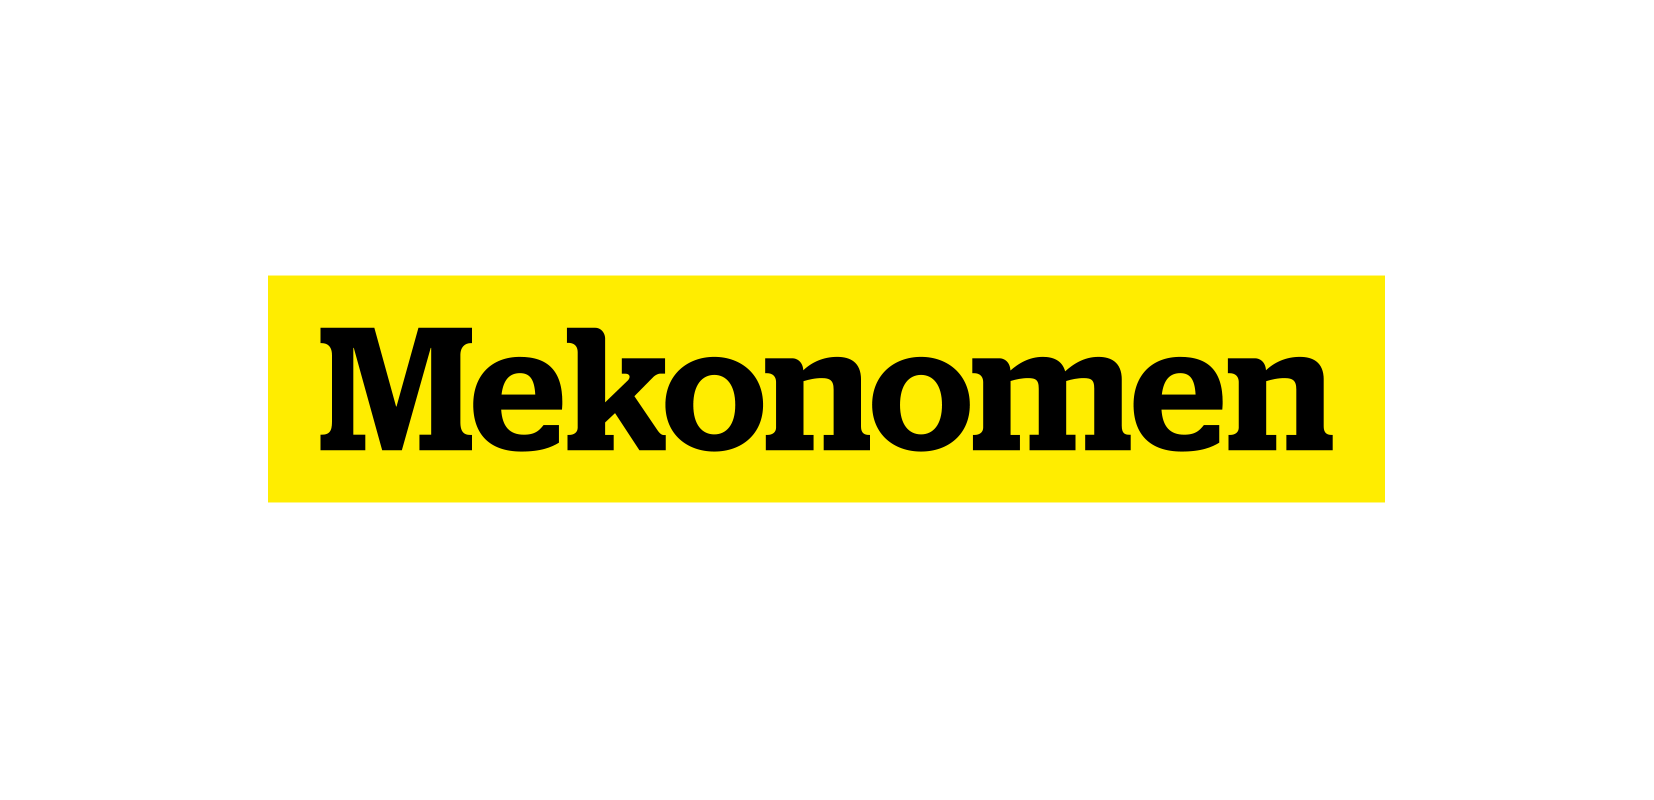 Mekonomen.png